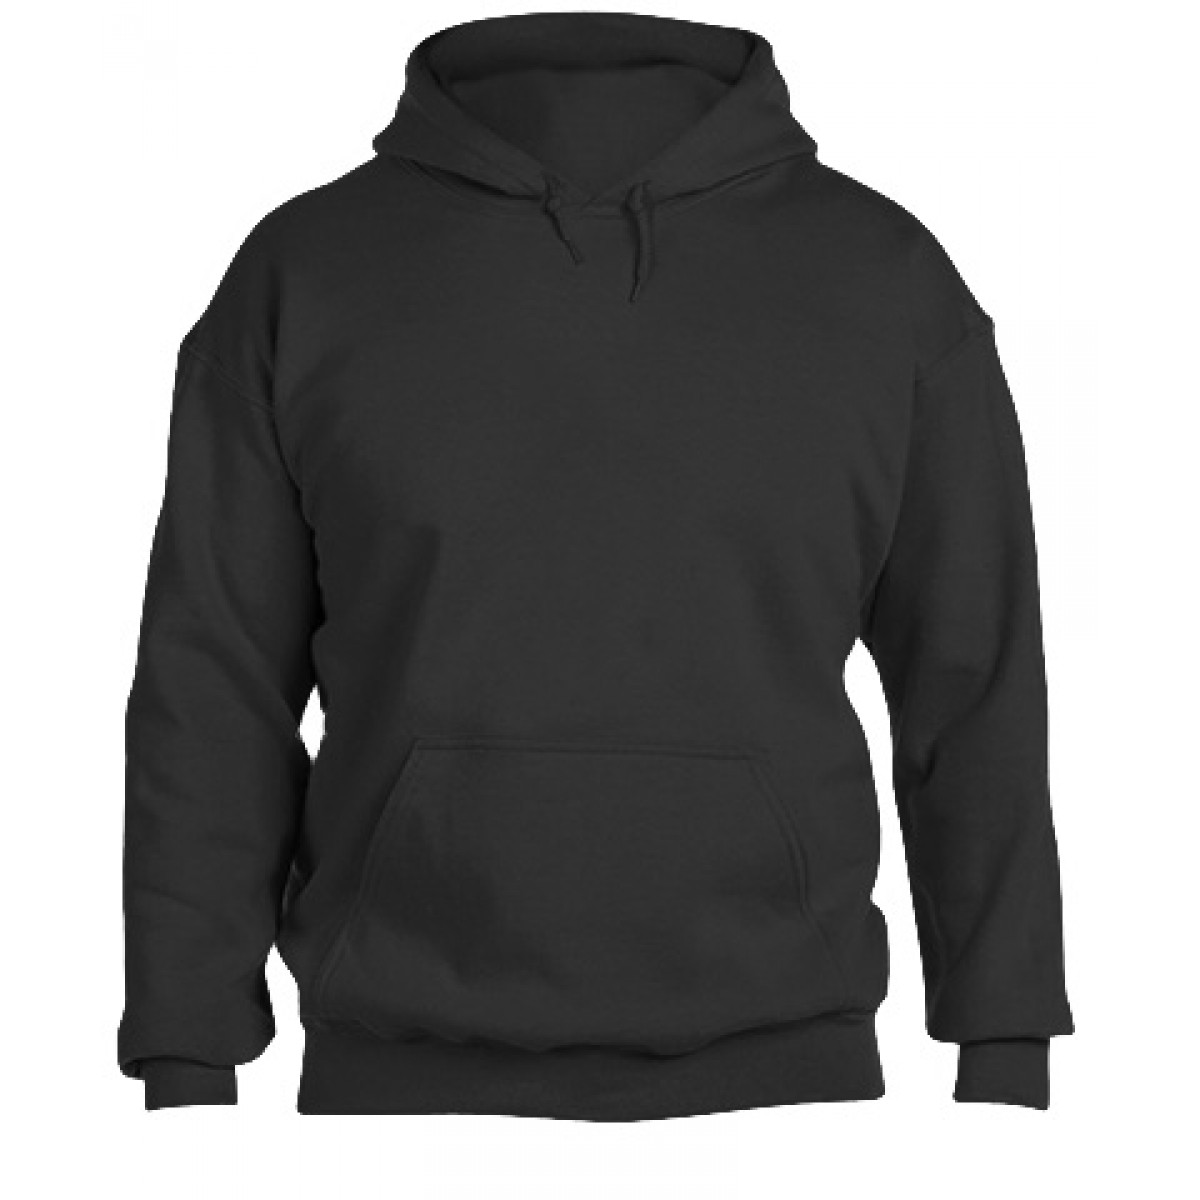 Solid Hooded Sweatshirt  50/50 Heavy Blend-Black-L